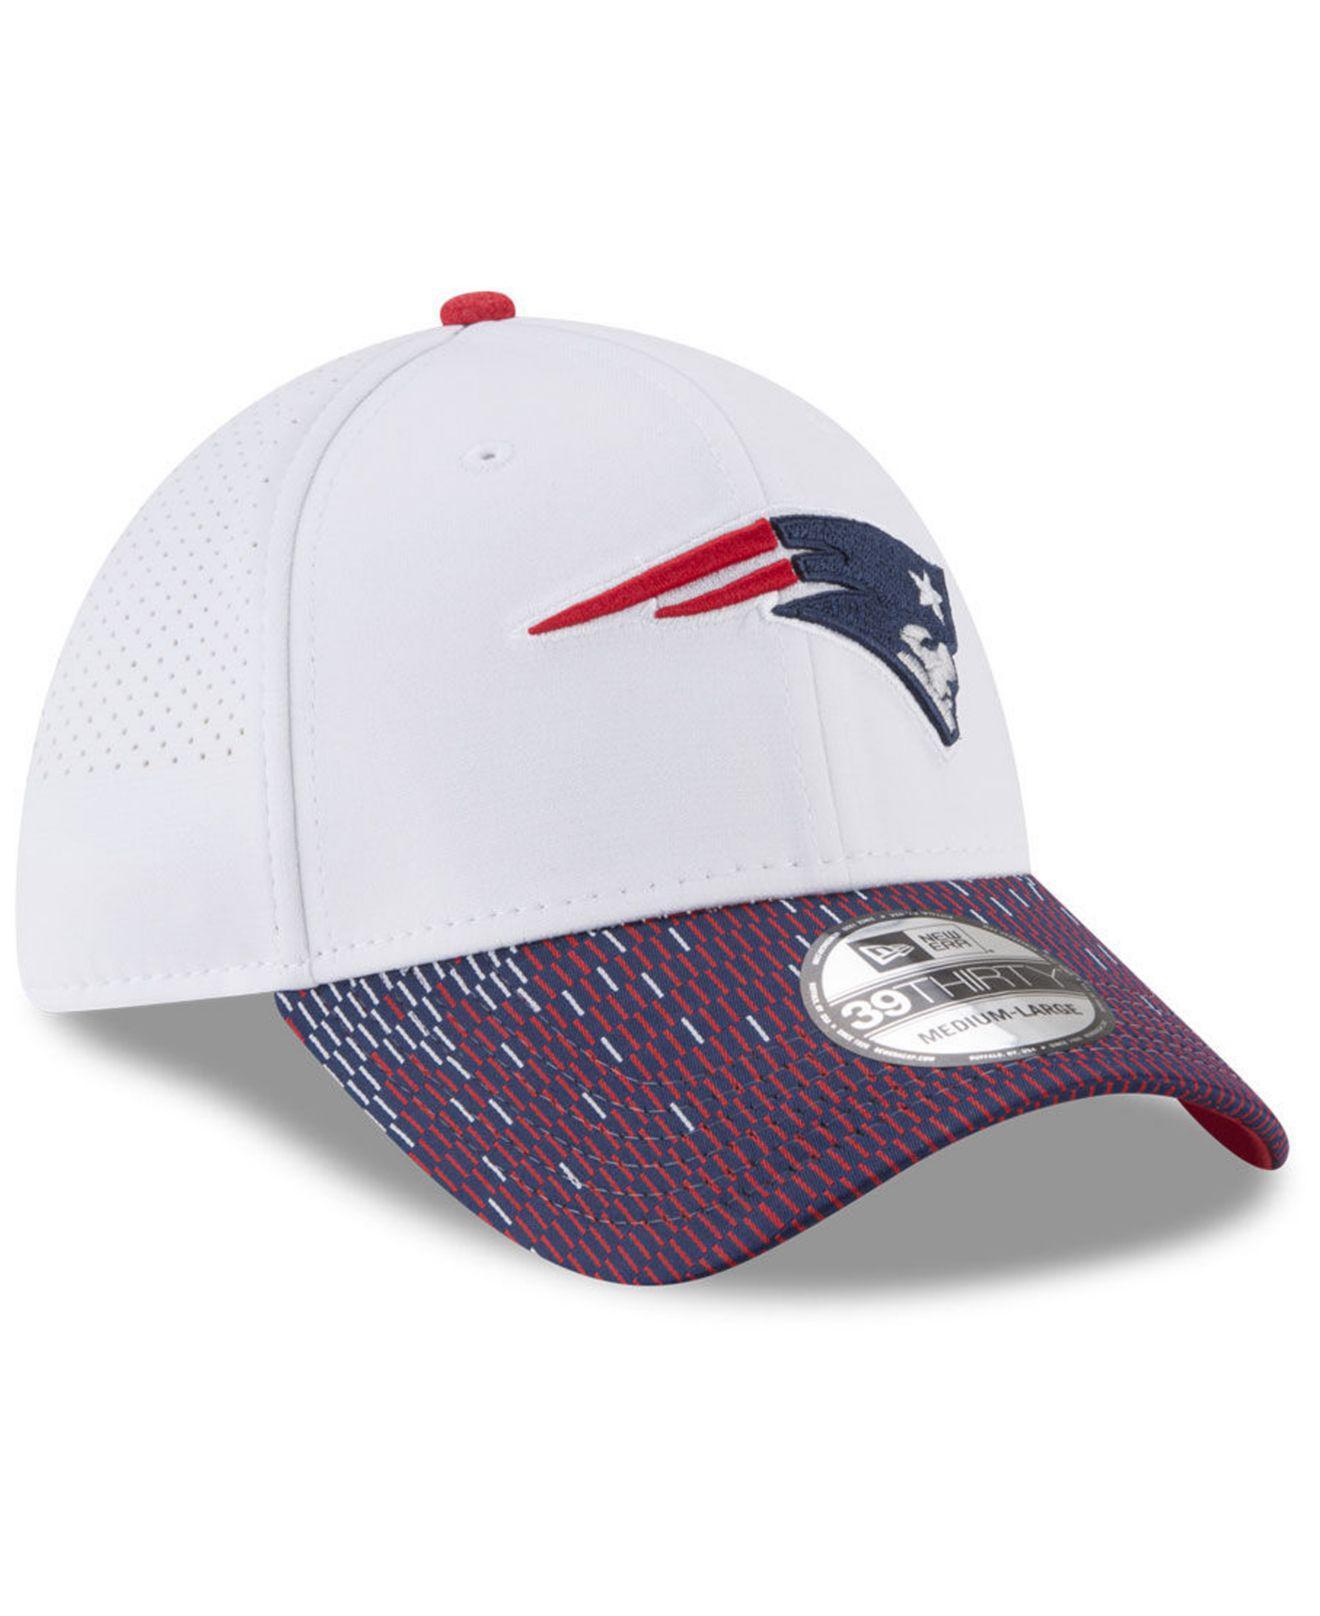 super popular db97a 82bde coupon code for philadelphia eagles new era nfl logo surge 39thirty cap  a3d67 00acd  good lyst ktz new england patriots equalizer 39thirty cap for  men 28c3f ...